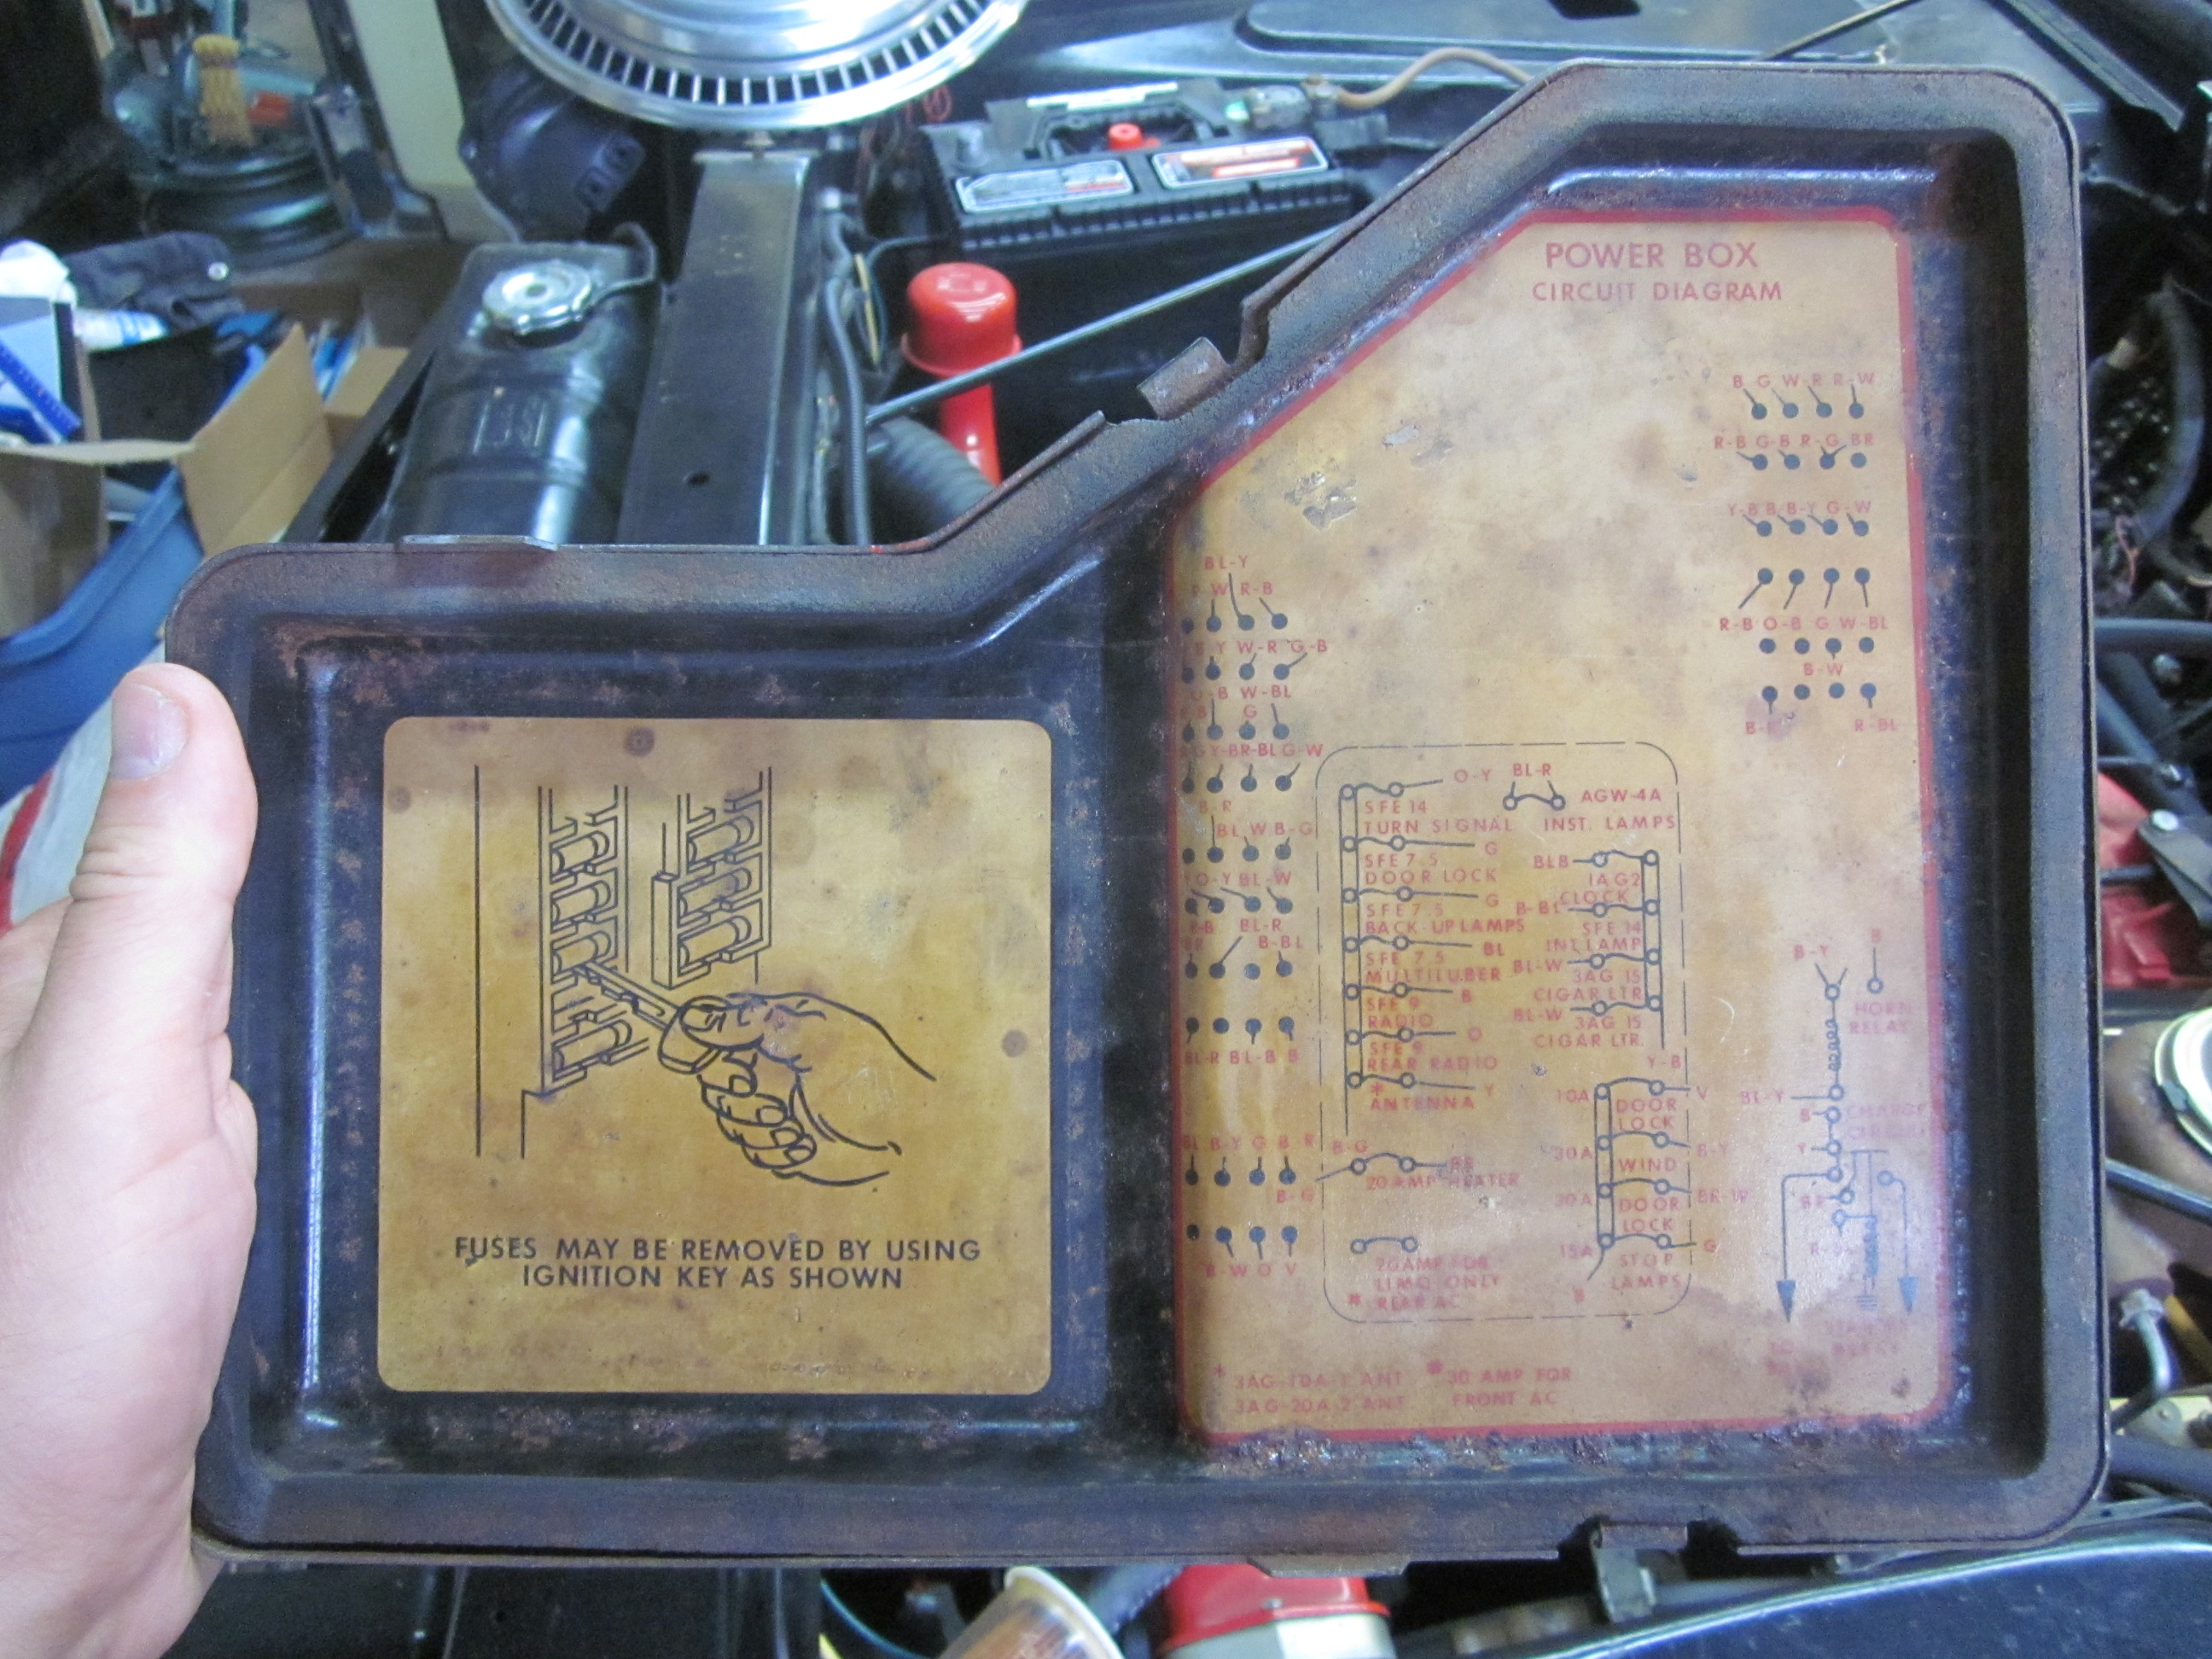 1970 ford thunderbird fuse box diagram wiring diagrams mon 1970 ford thunderbird fuse box location 1970 thunderbird fuse box [ 2592 x 1944 Pixel ]